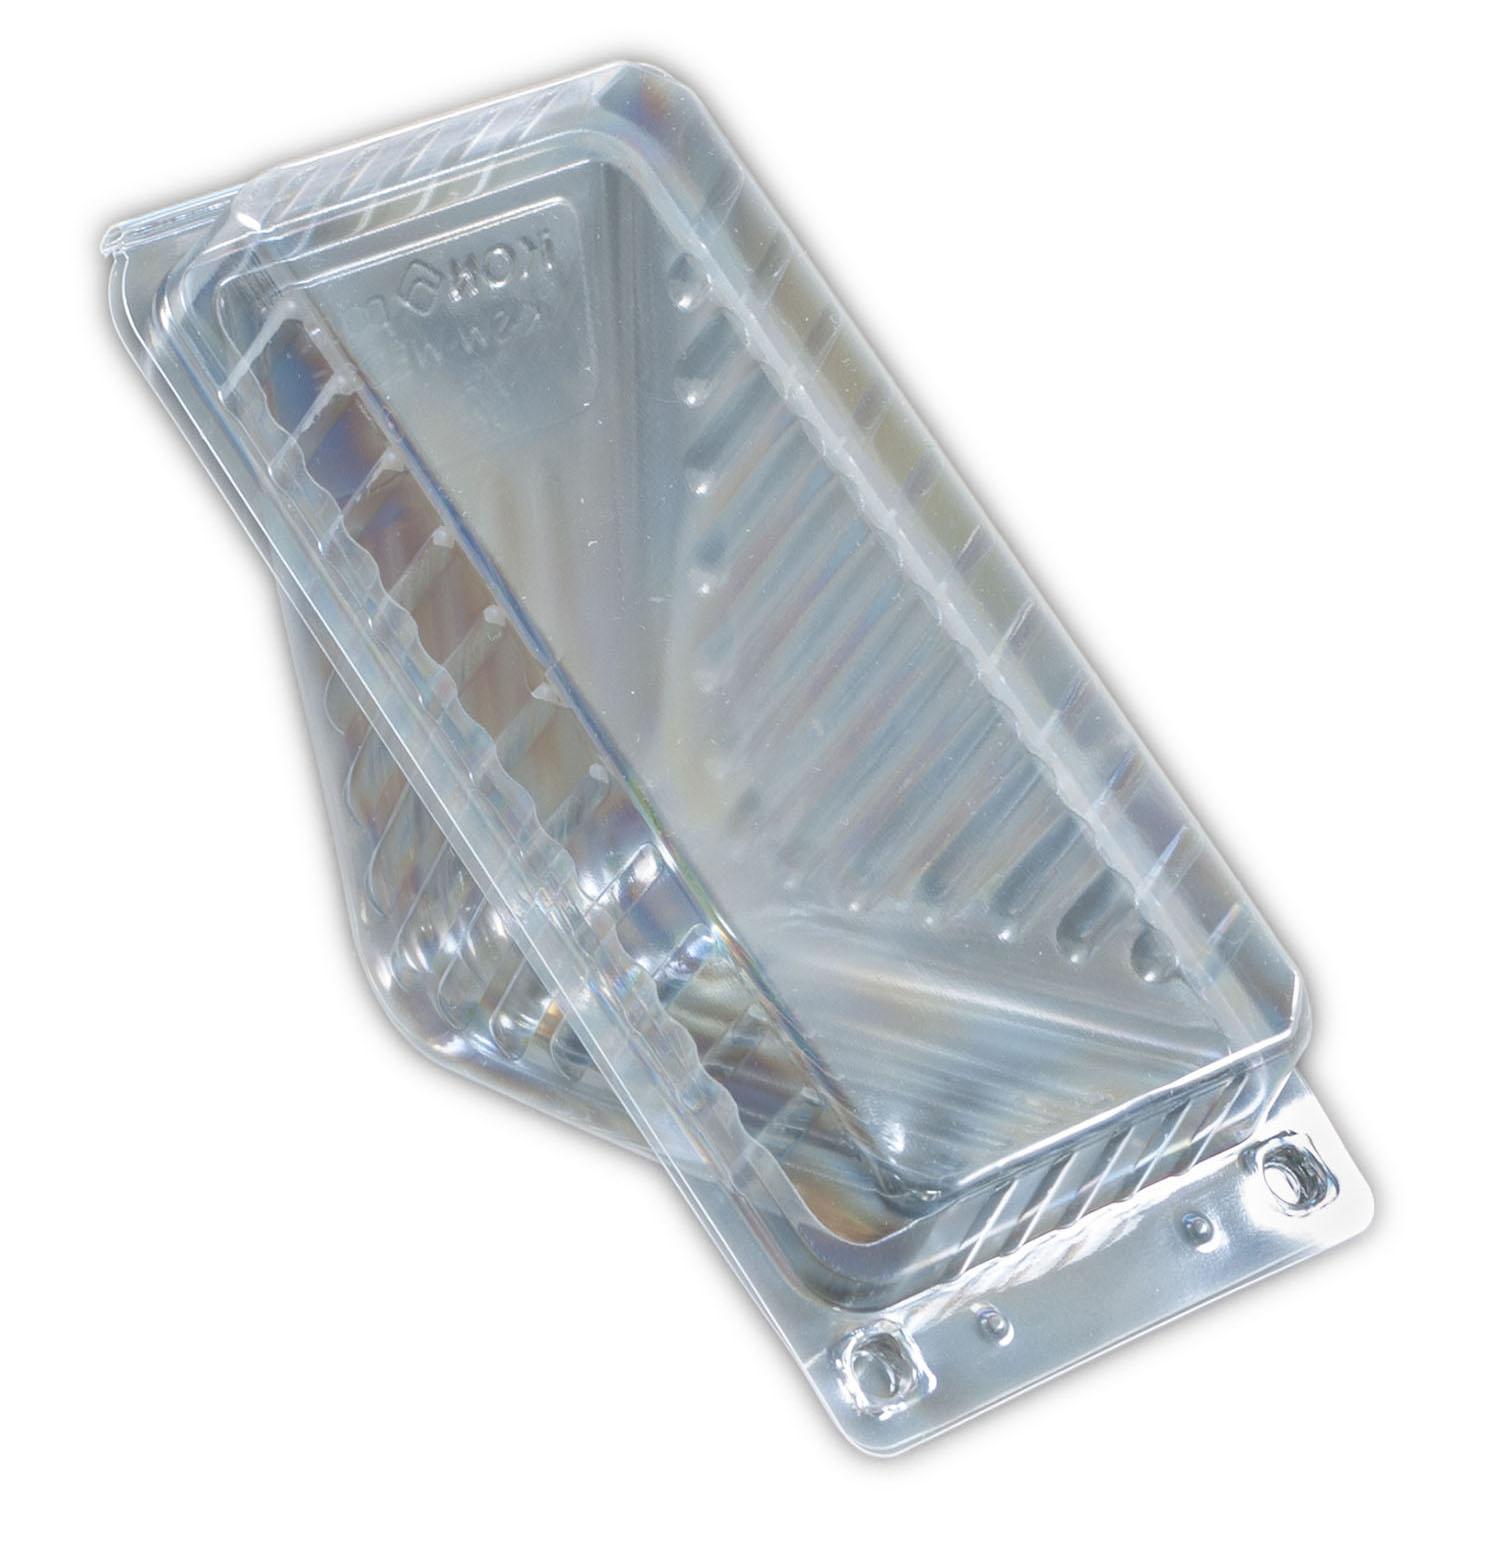 iK-SW-WEDGE Small Sandwich Wedge   77 x 136 x 62 mm  125 per slv 500 per carton